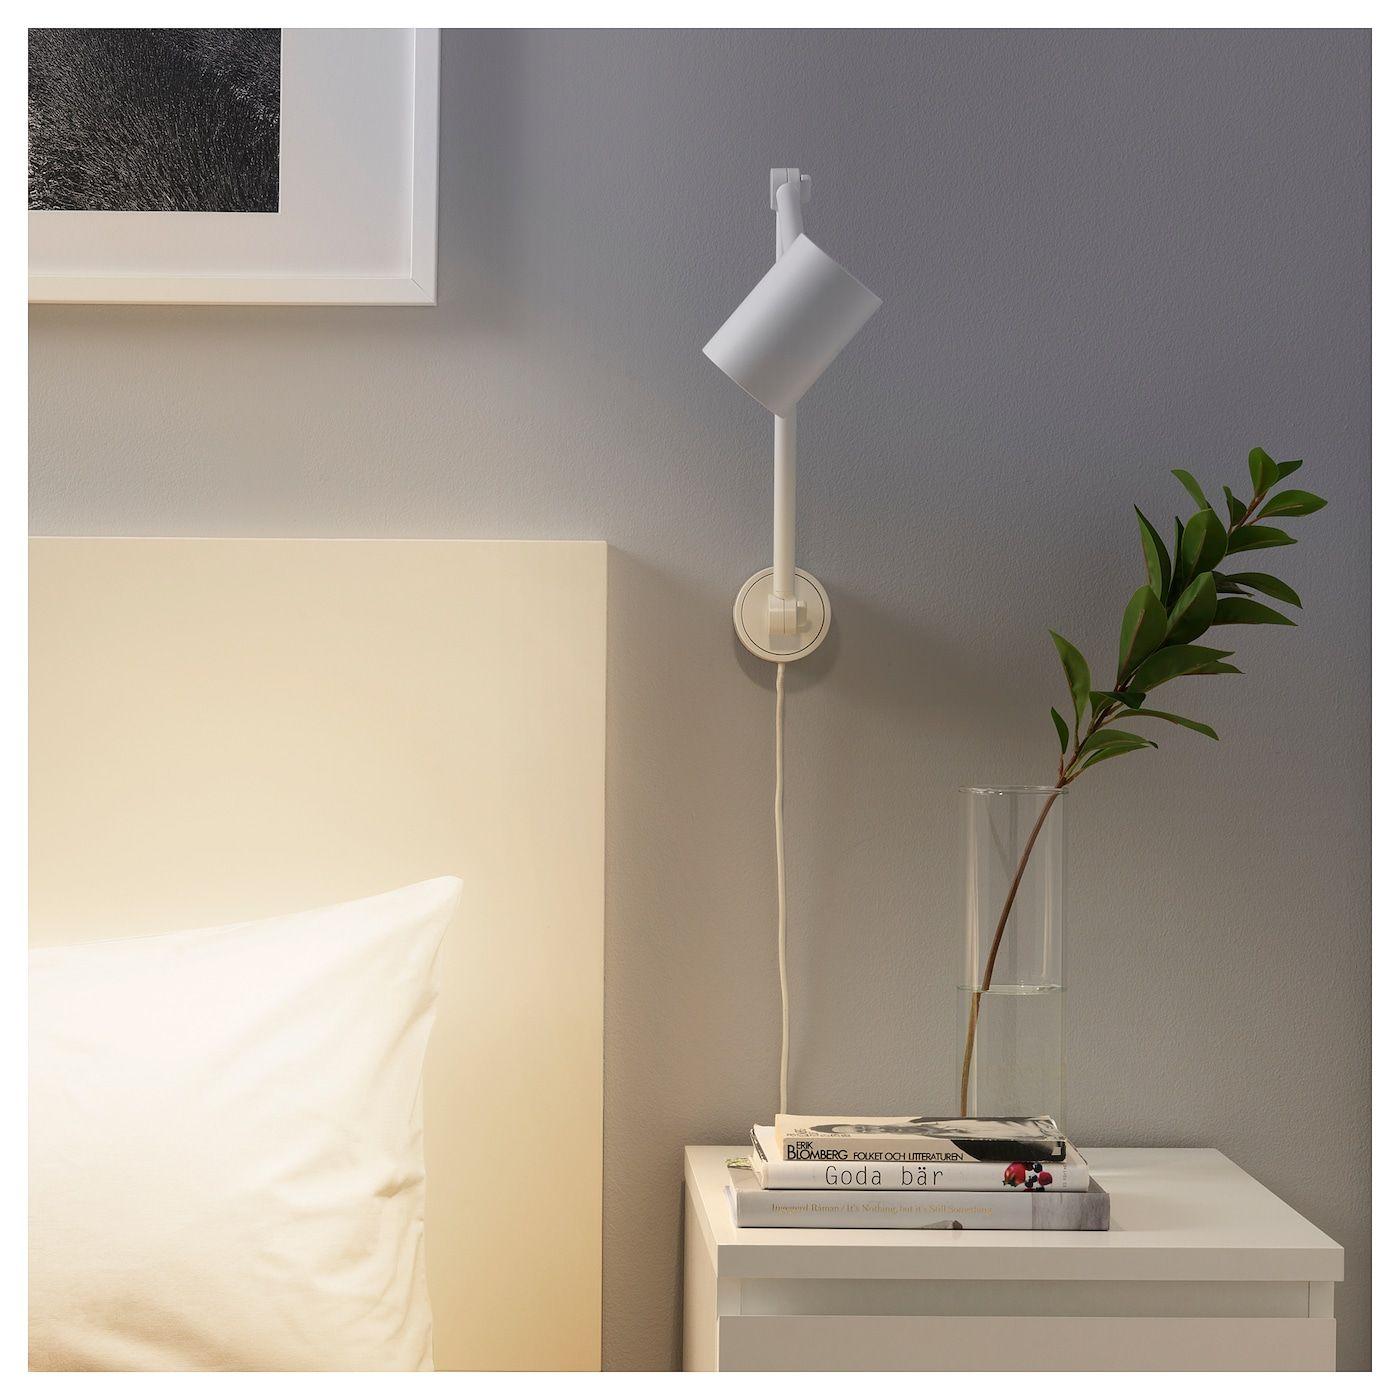 Nymane Work Wall Lamp White Wandleuchte Weiss Wandleuchte